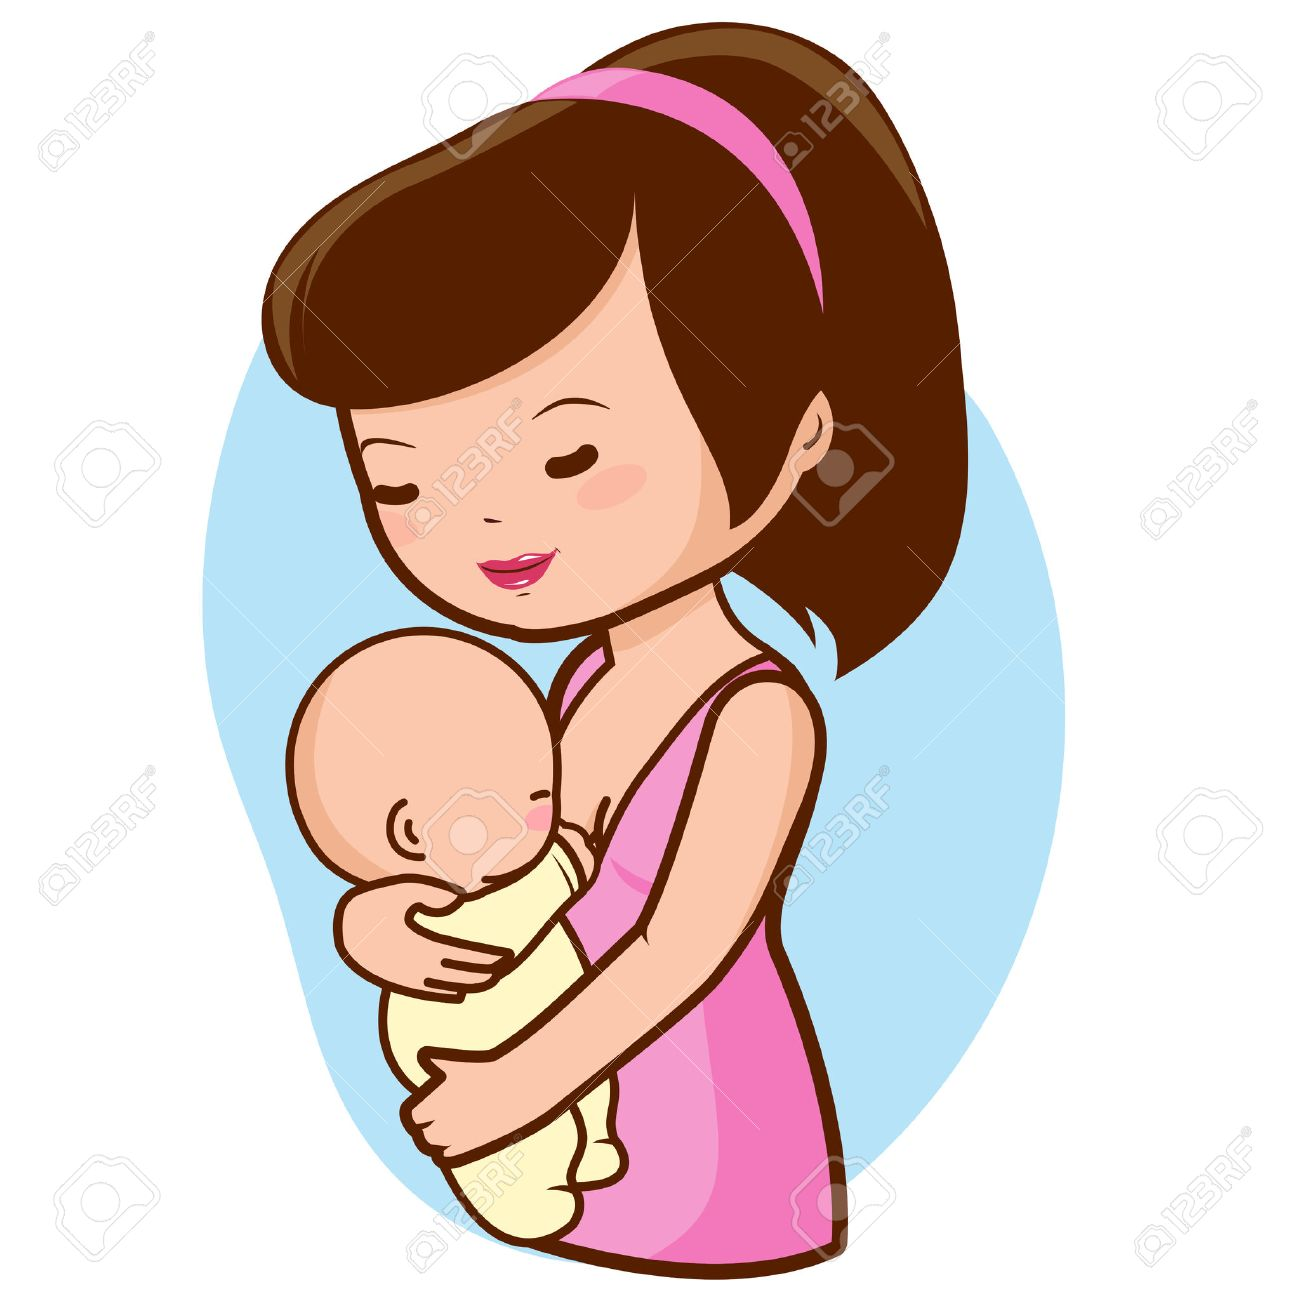 Mother breastfeeding baby - 44877855